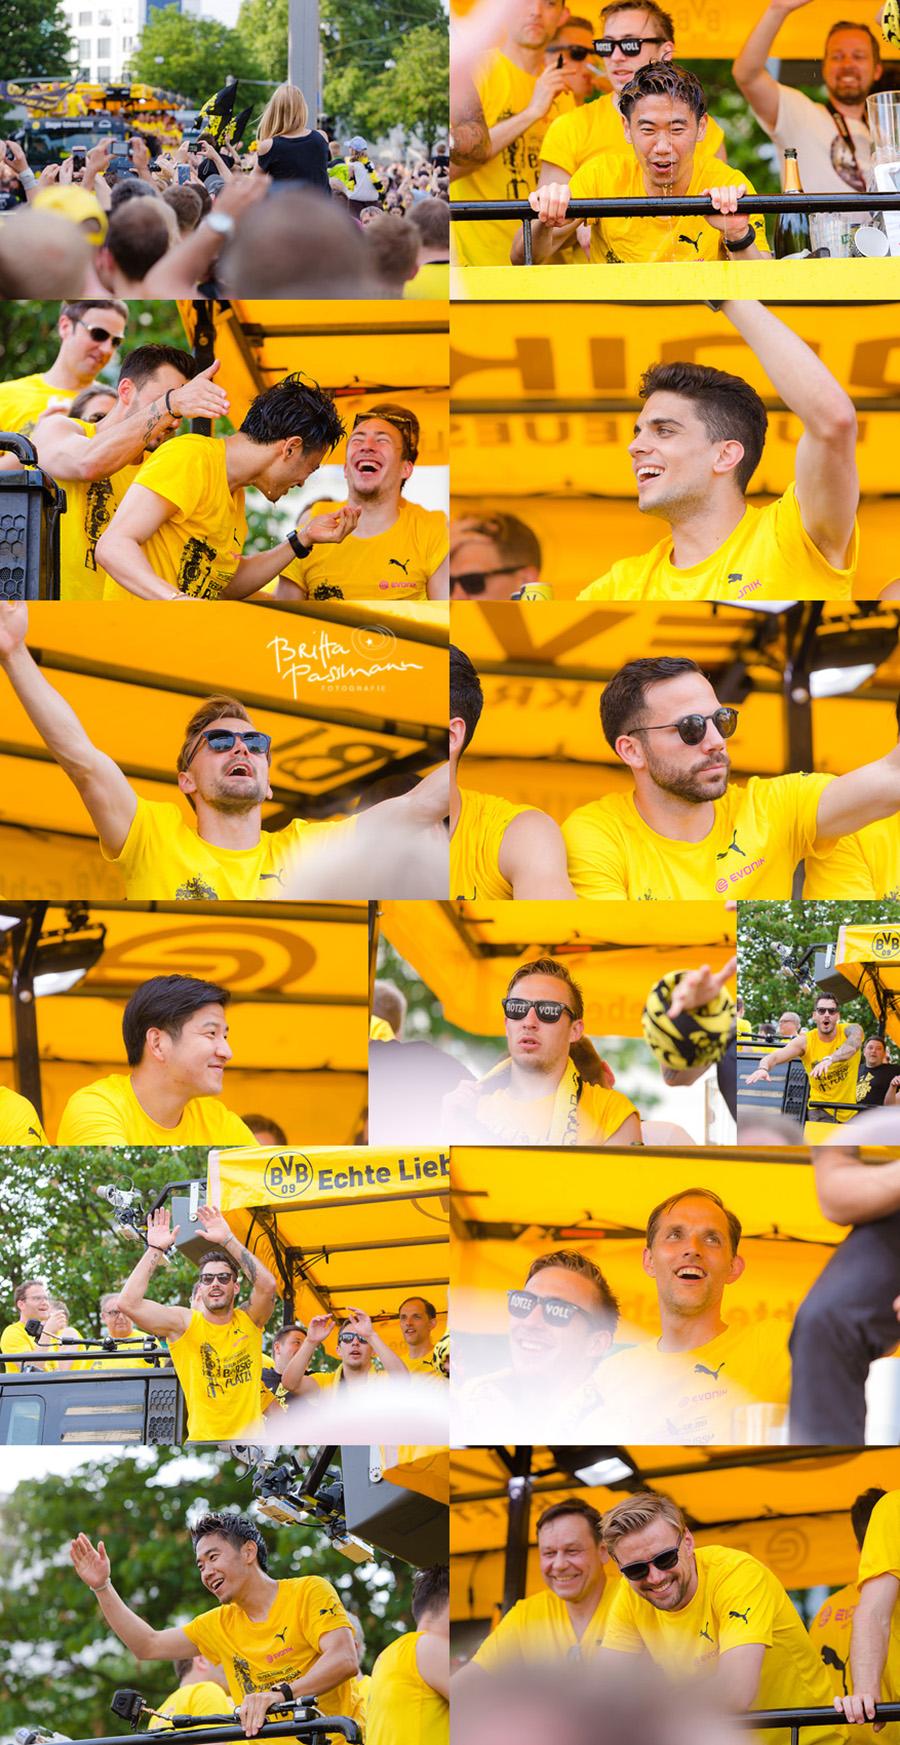 BVB_Borussia_Dortmund_Pokalsieger_2017_Borsigplatz_Britta_Passmann_04